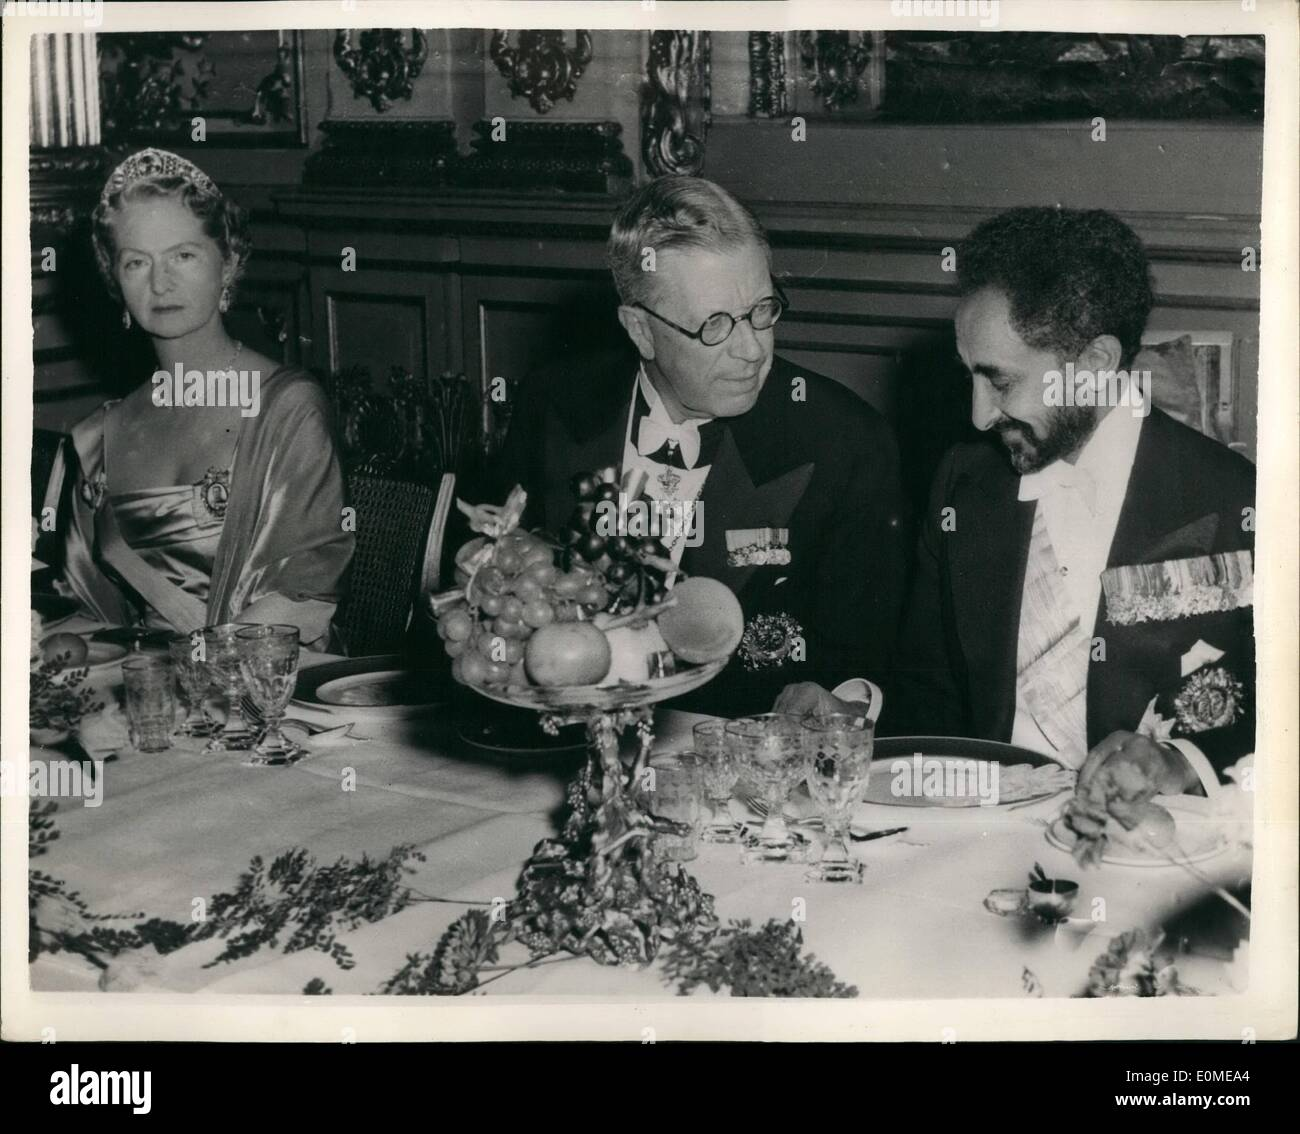 Nov  11, 1954 - Haile Selassie in Stockholm: Haile Selassie